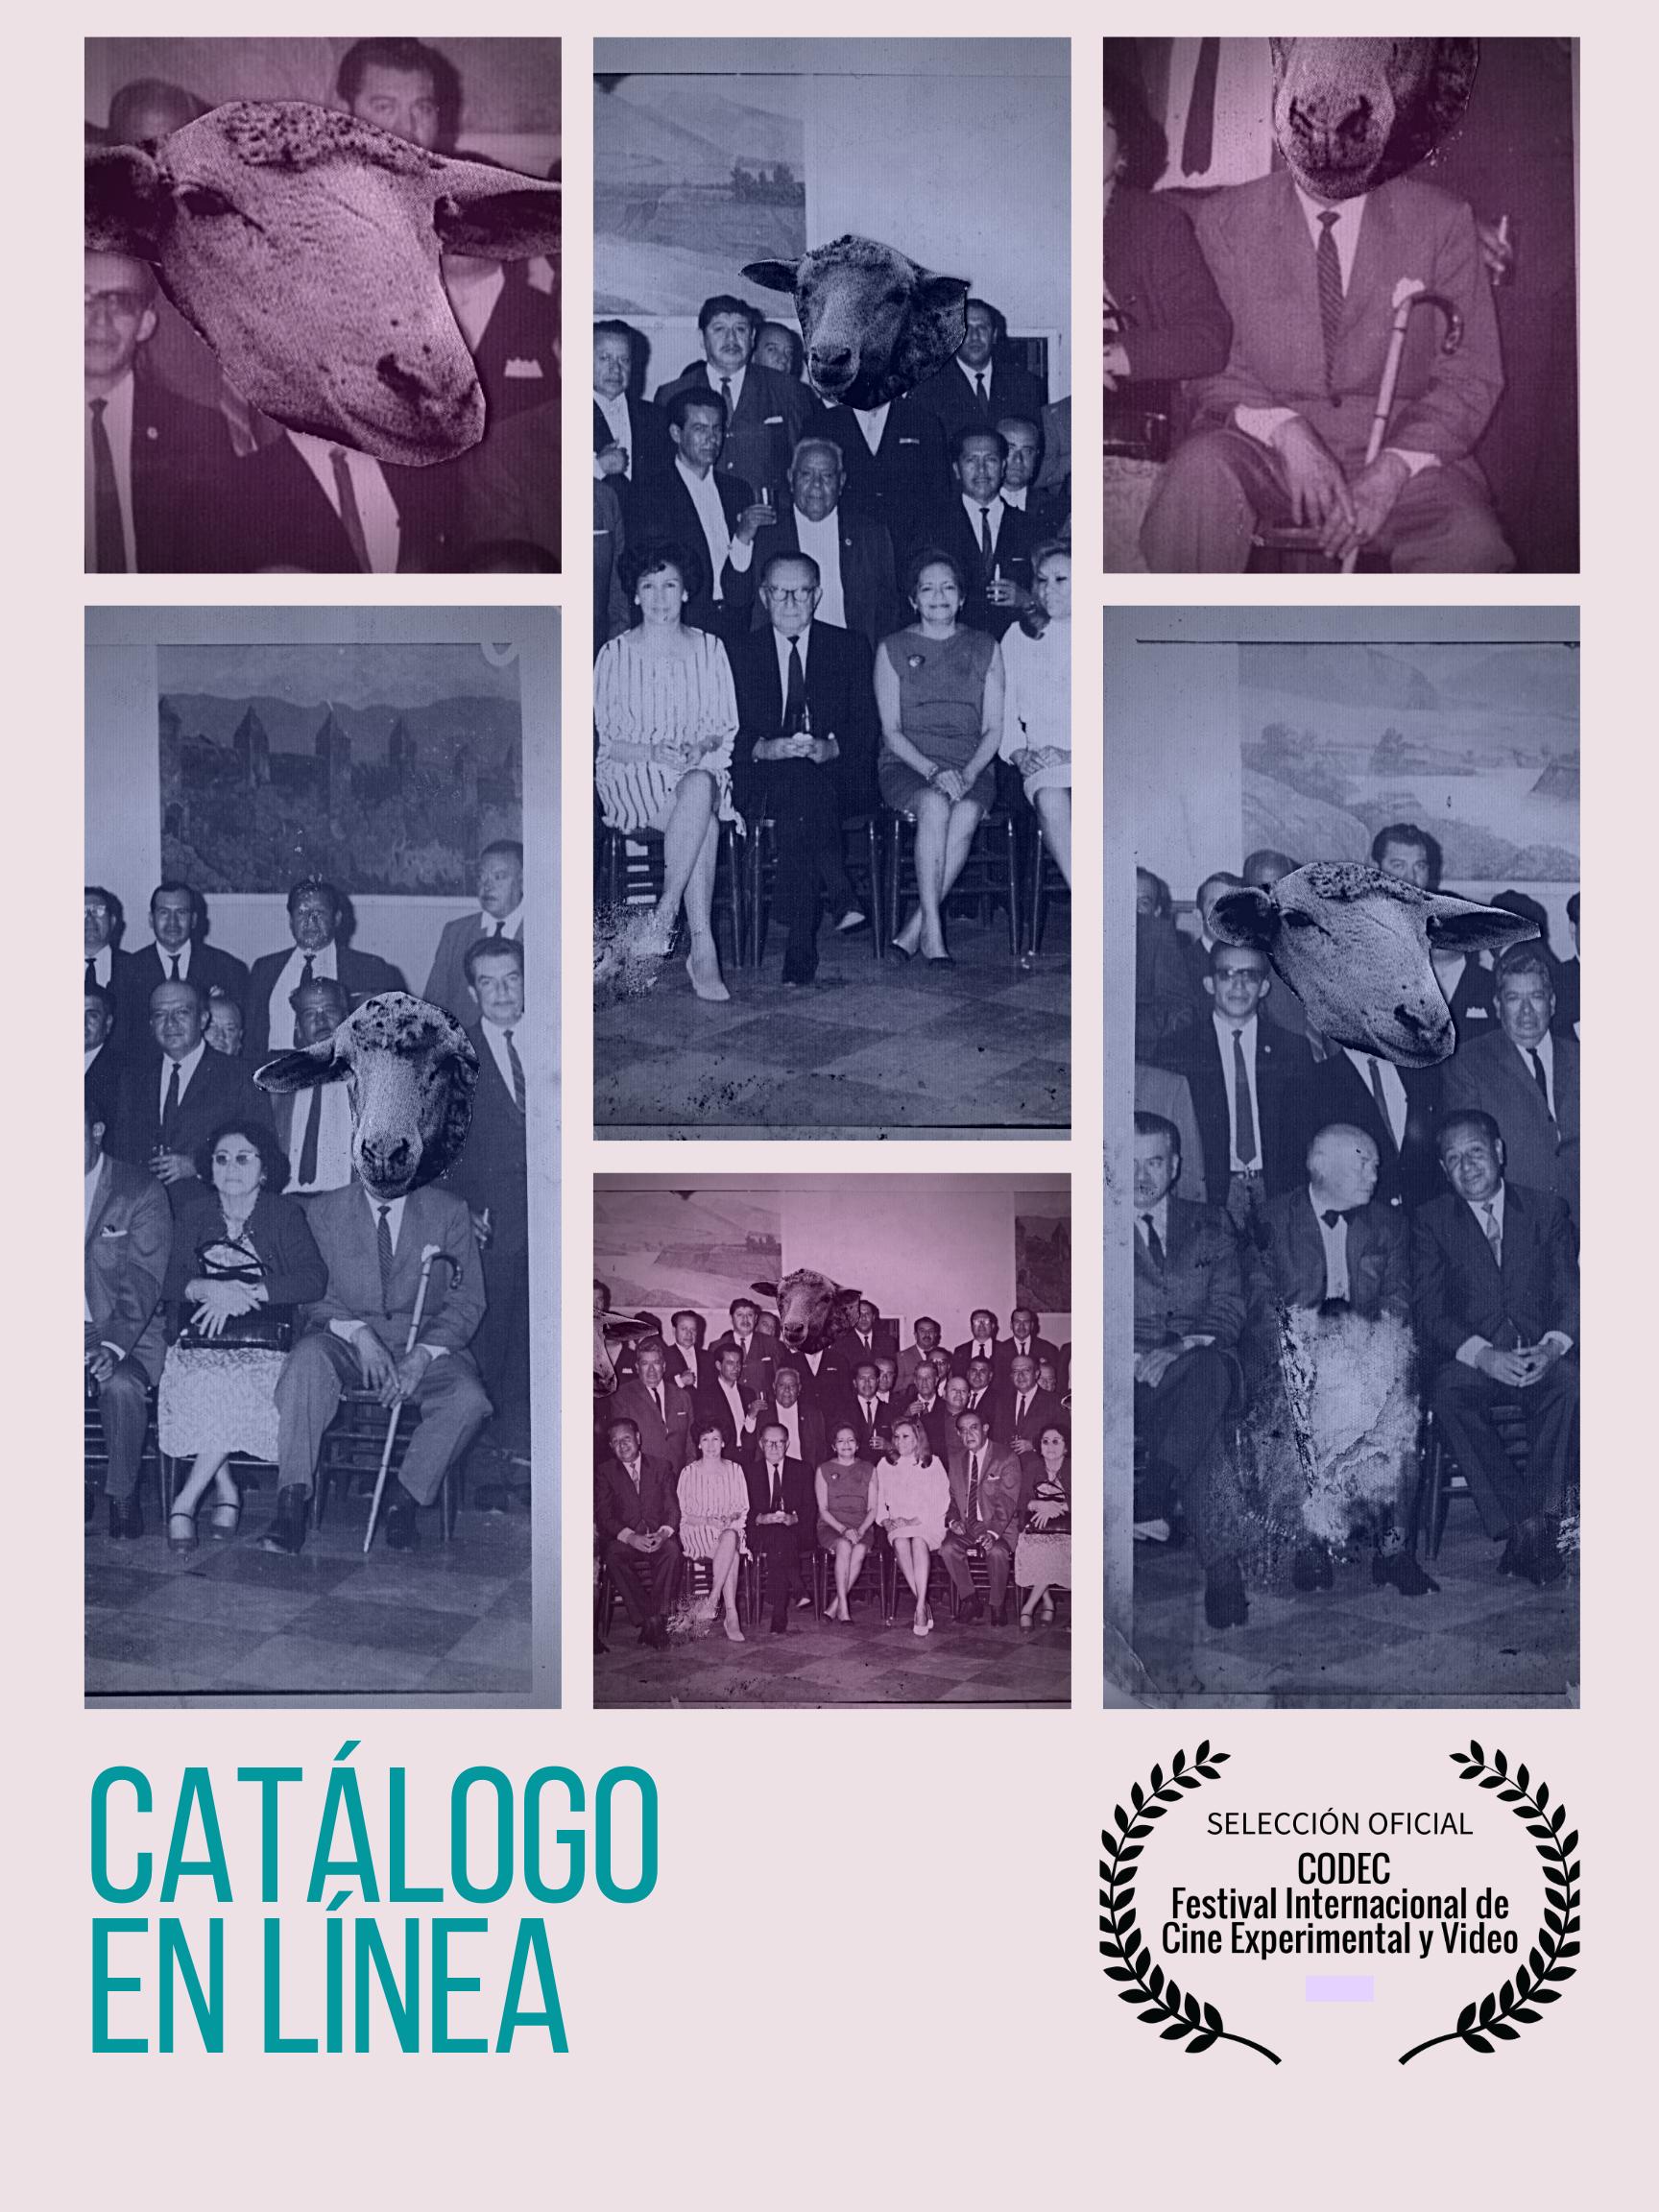 The Separation Loop @ the online Catalouge from the Festival Internacional de Cine Experimental Y Video